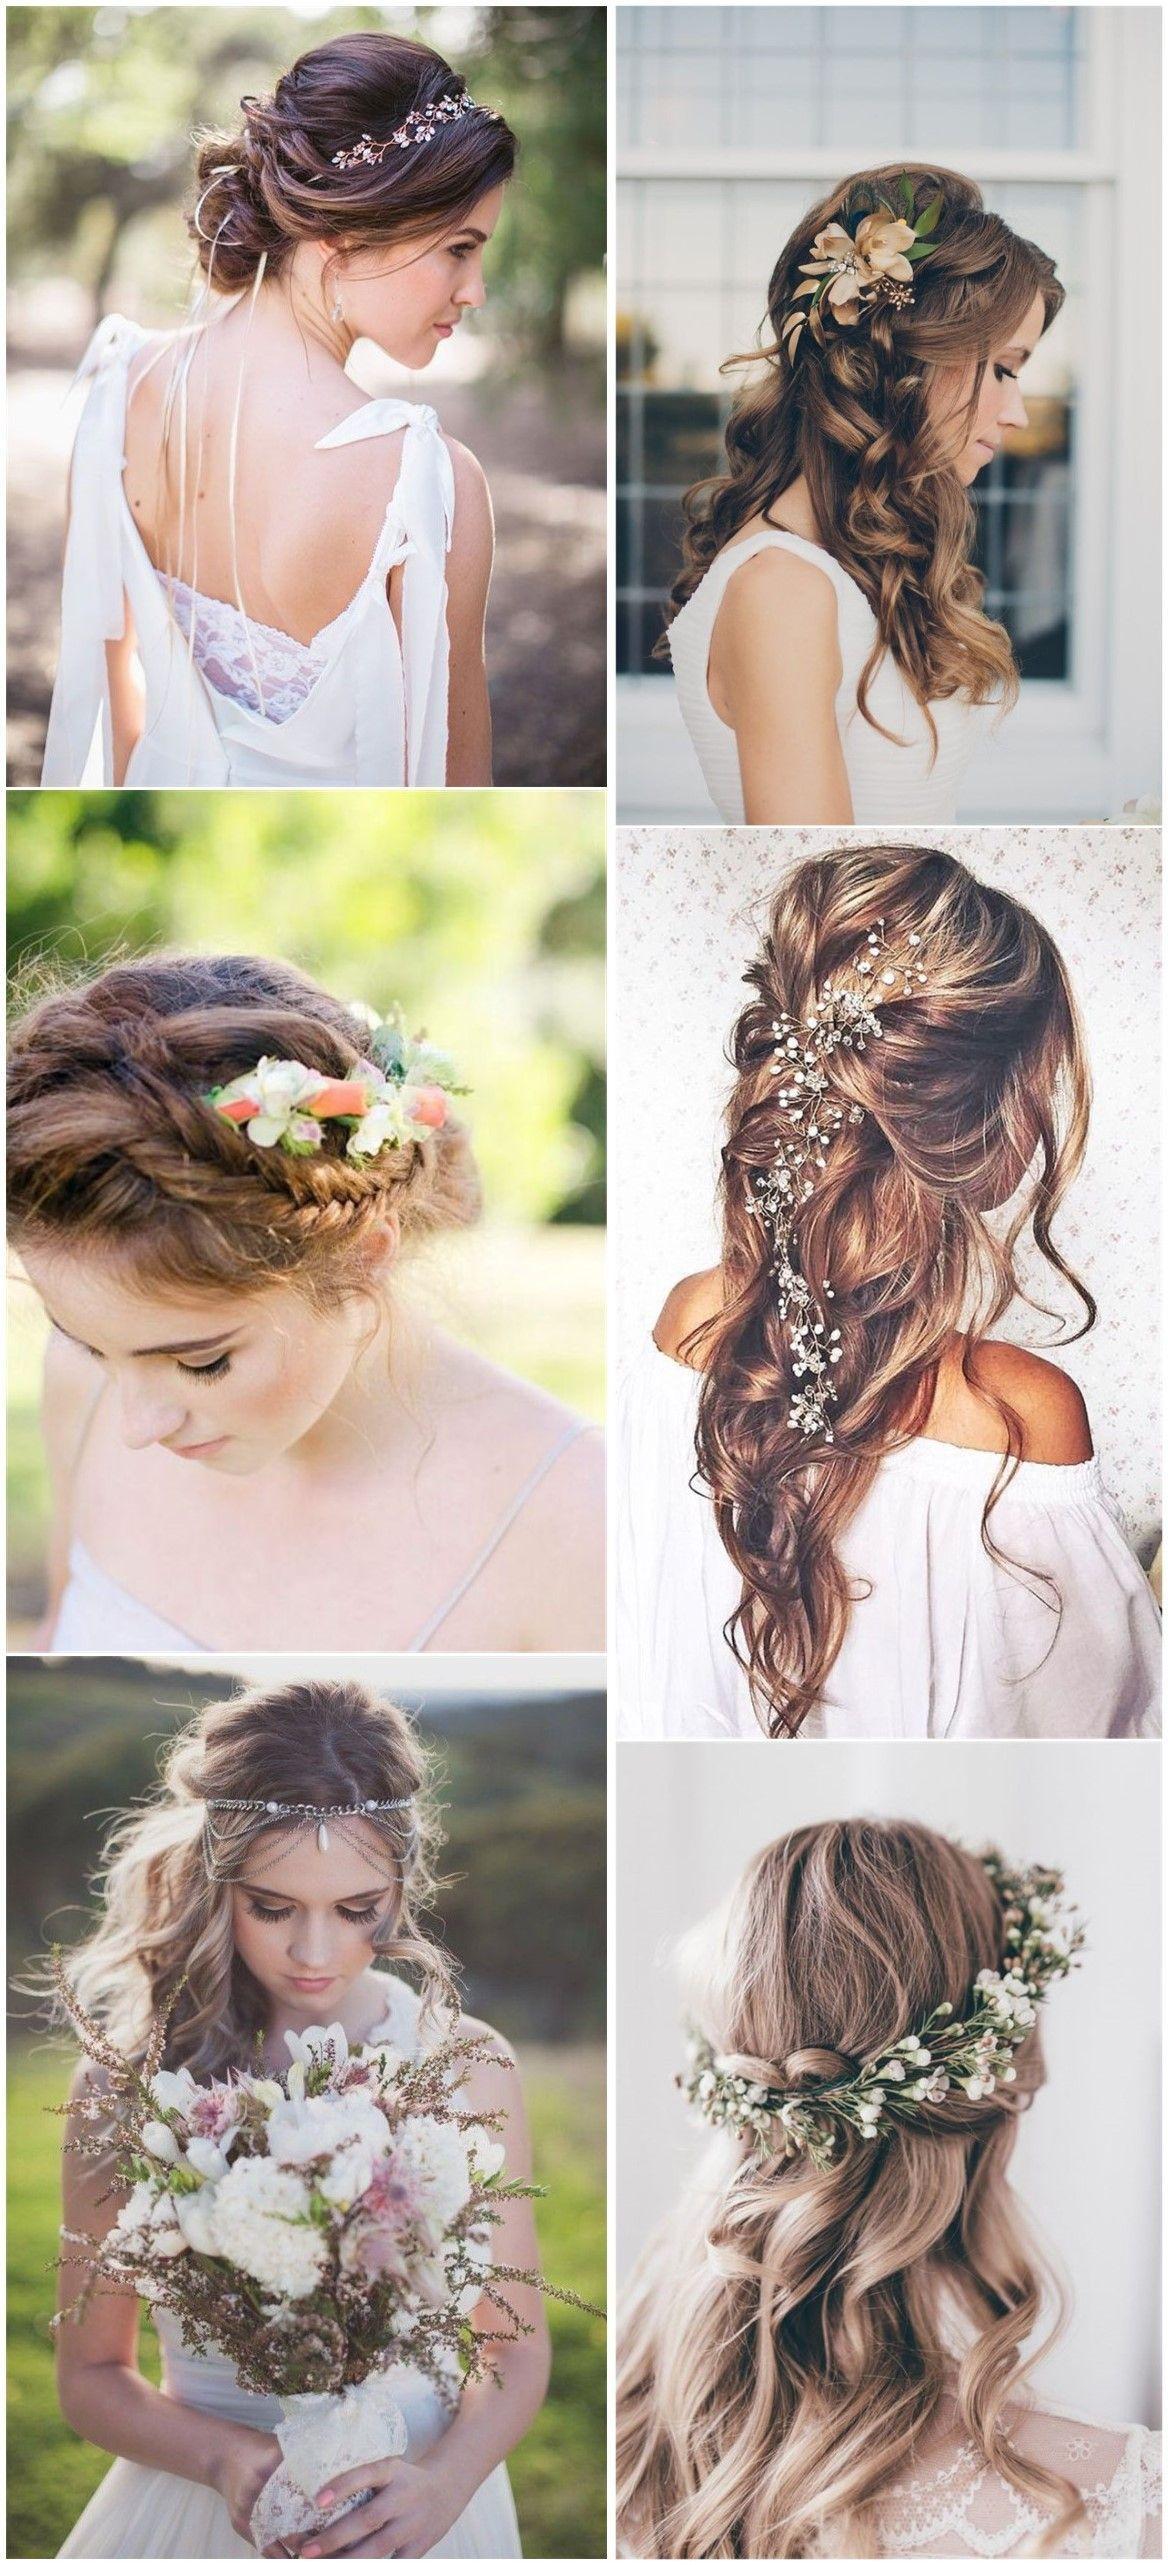 Womenus medium hairstyle wedge hairstyles pinterest bridal